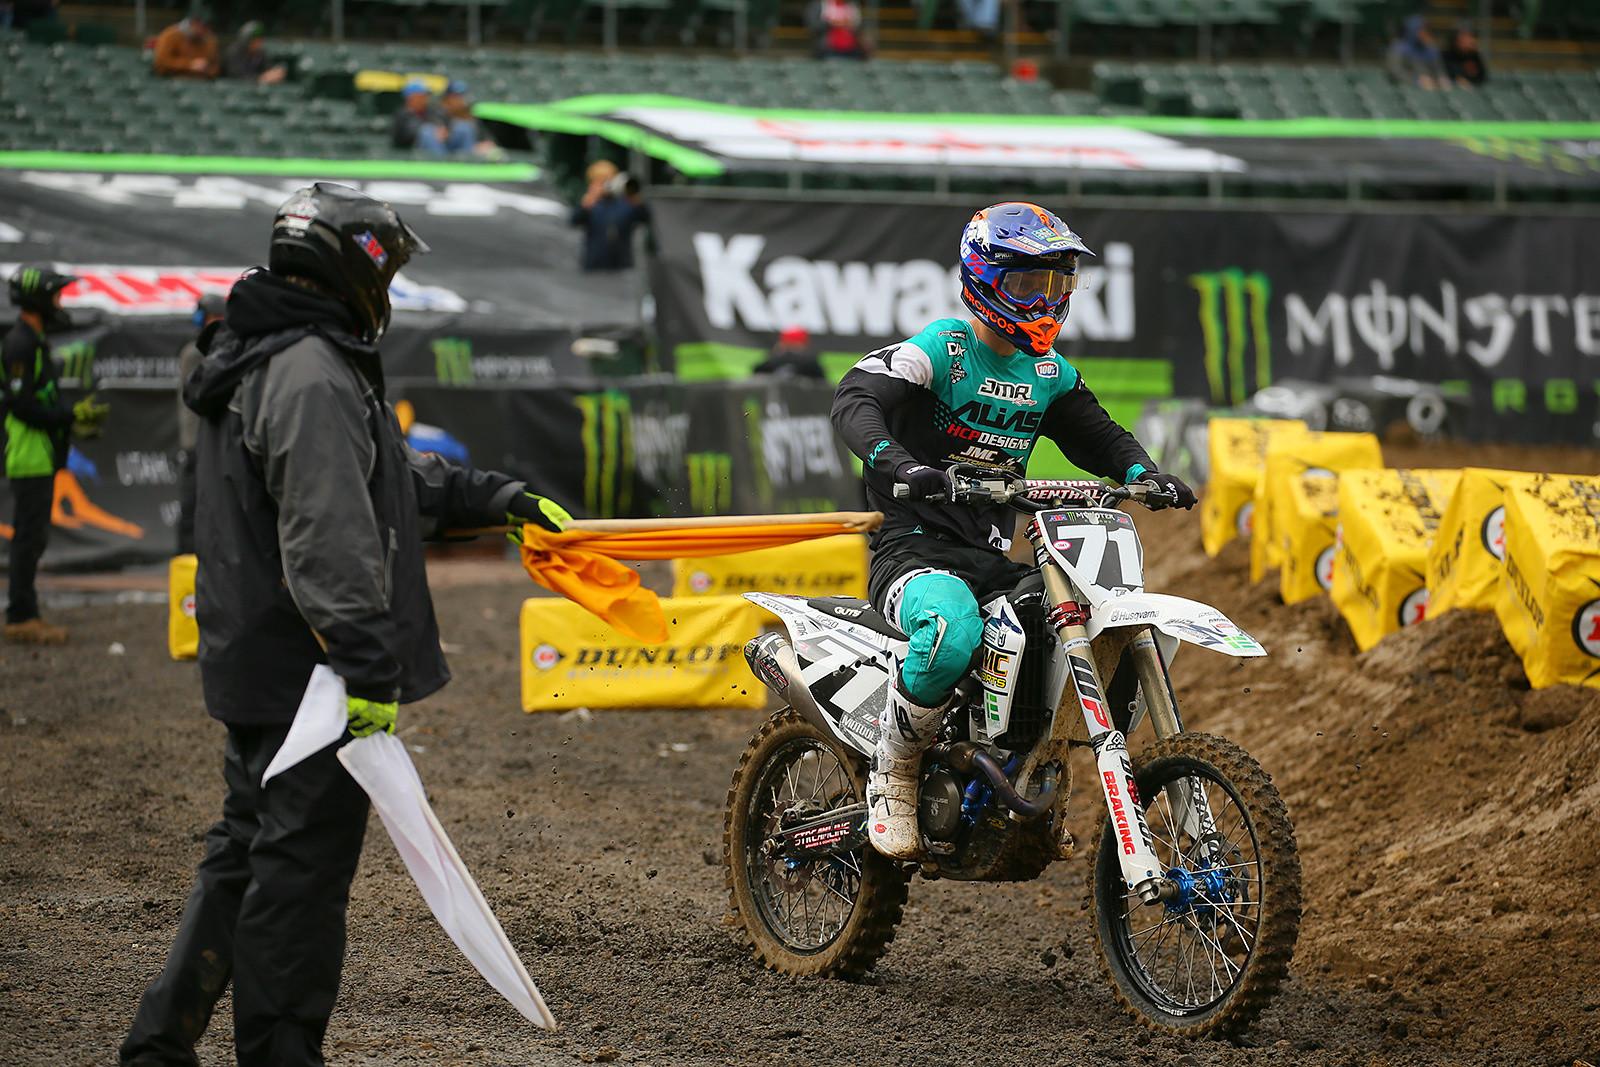 Chicane - Vital MX Pit Bits: Oakland - Motocross Pictures - Vital MX